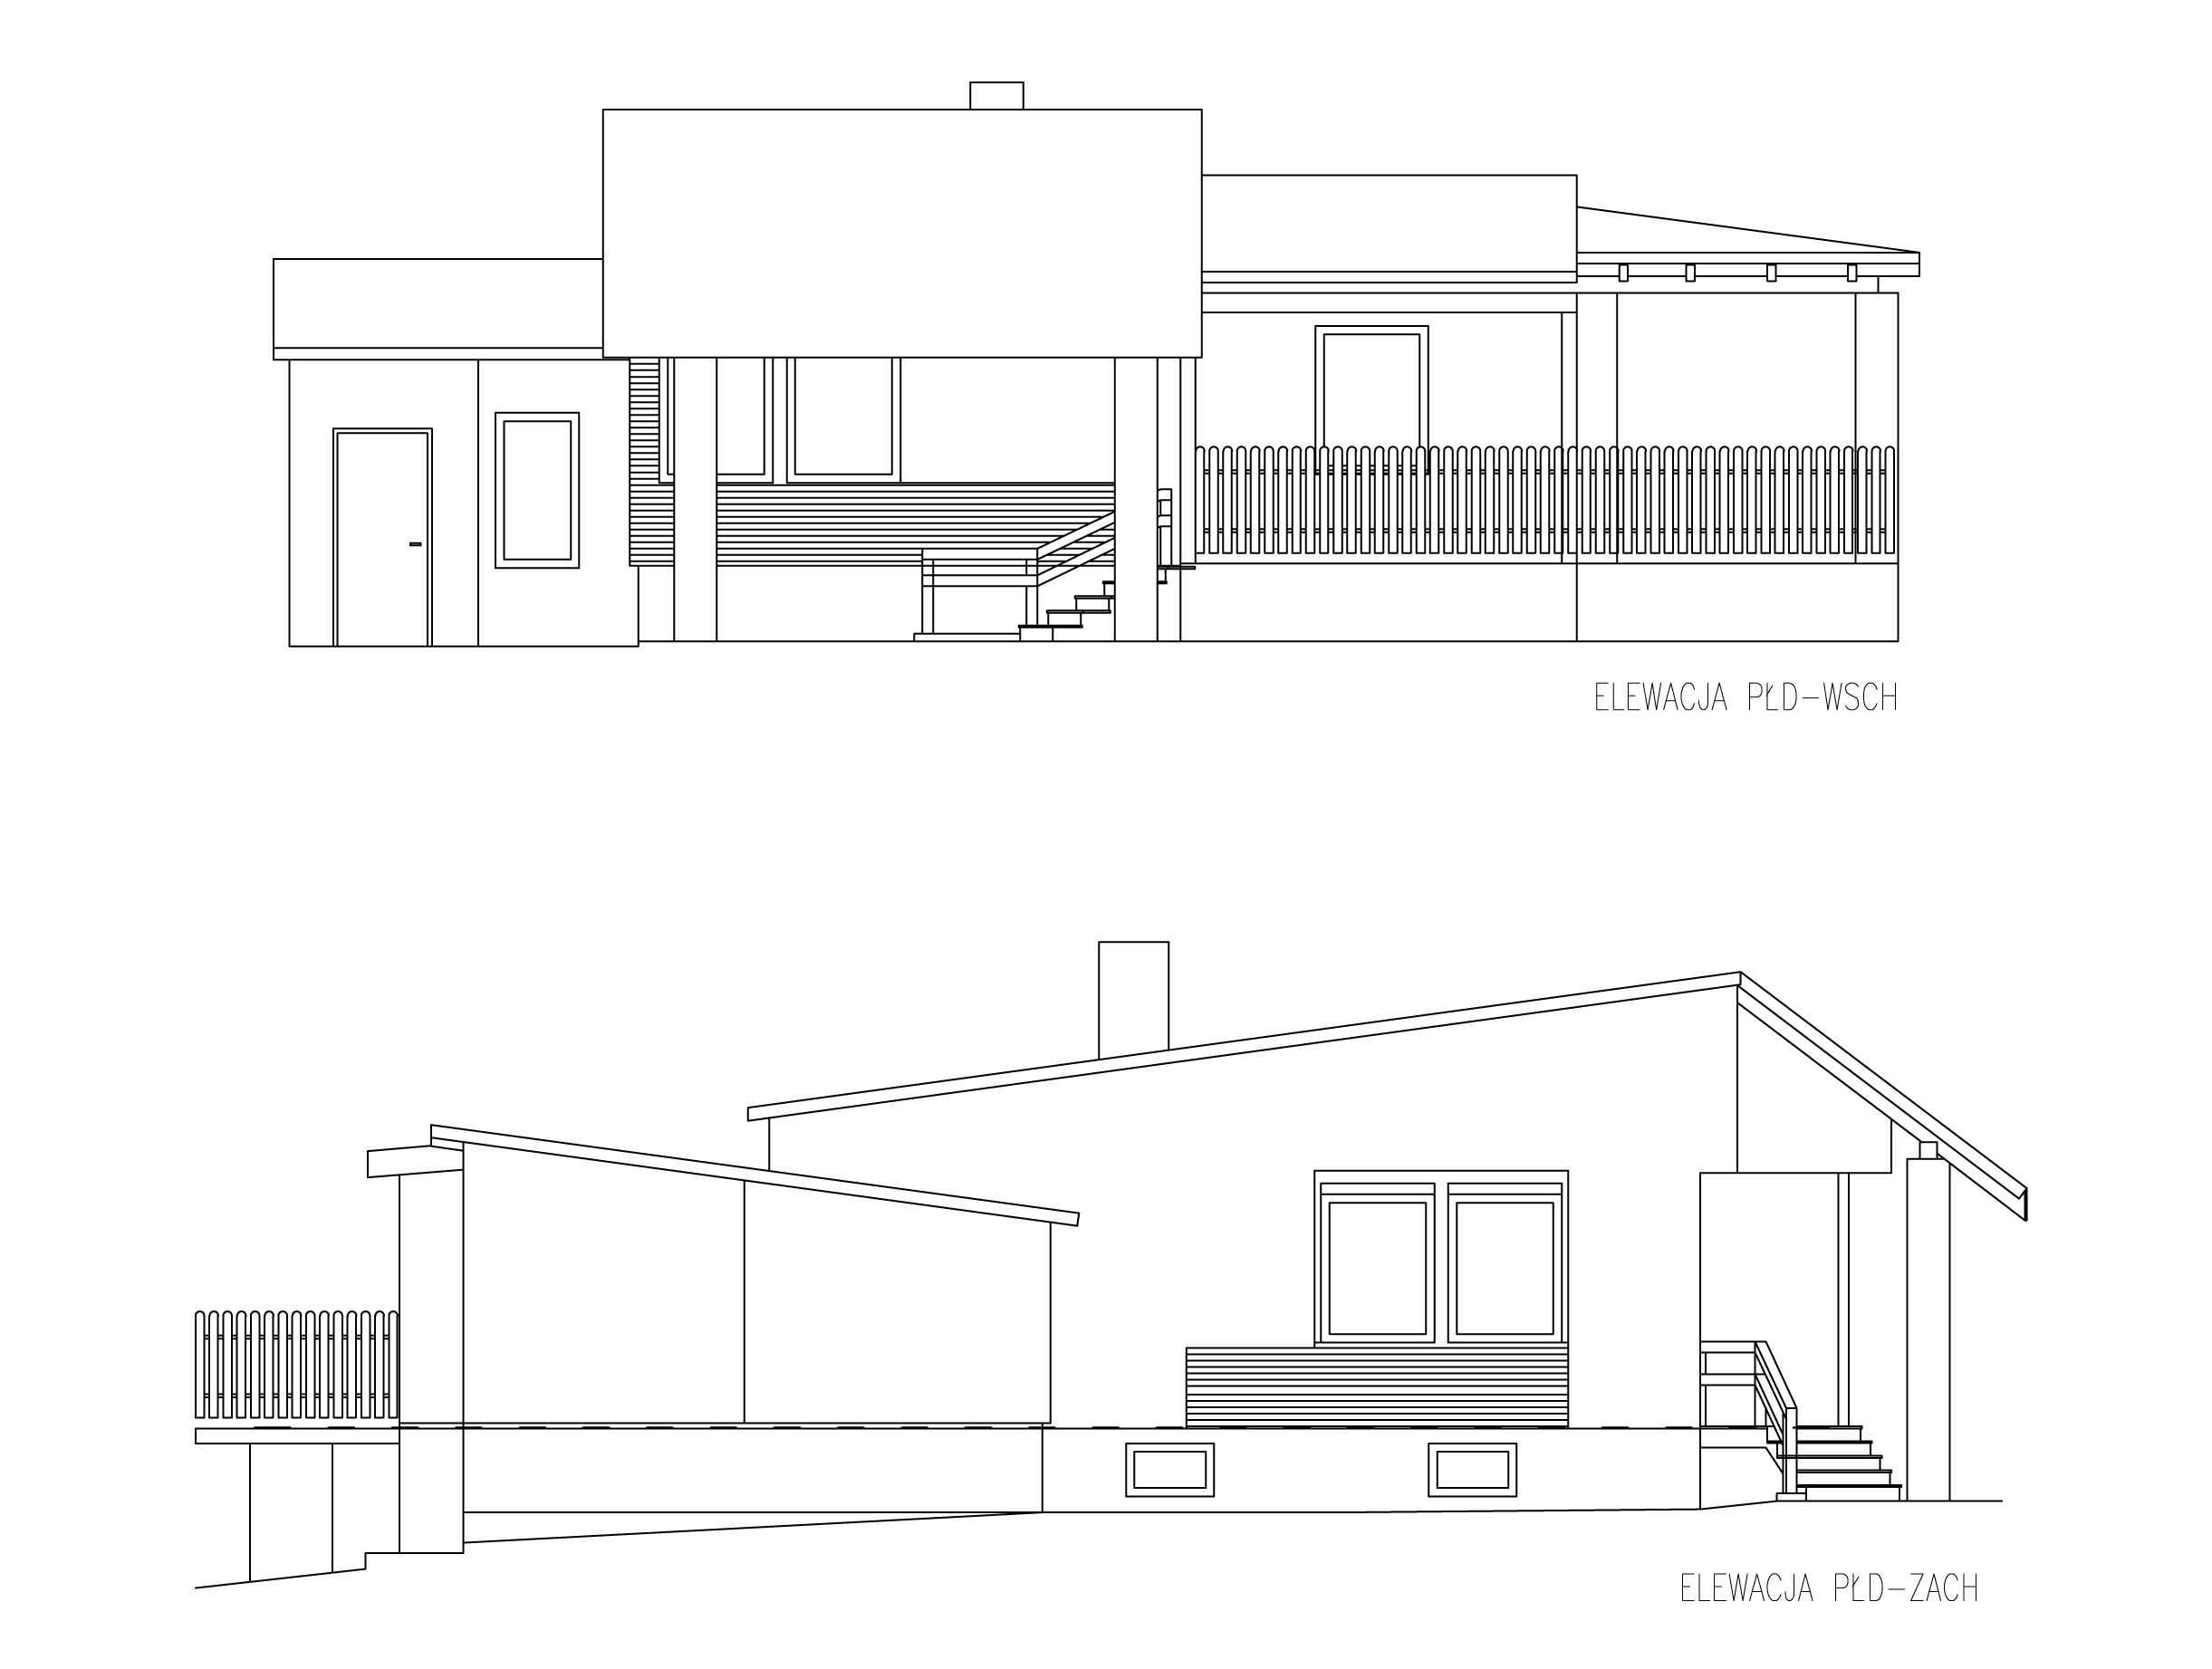 szkic Jozef Lewin